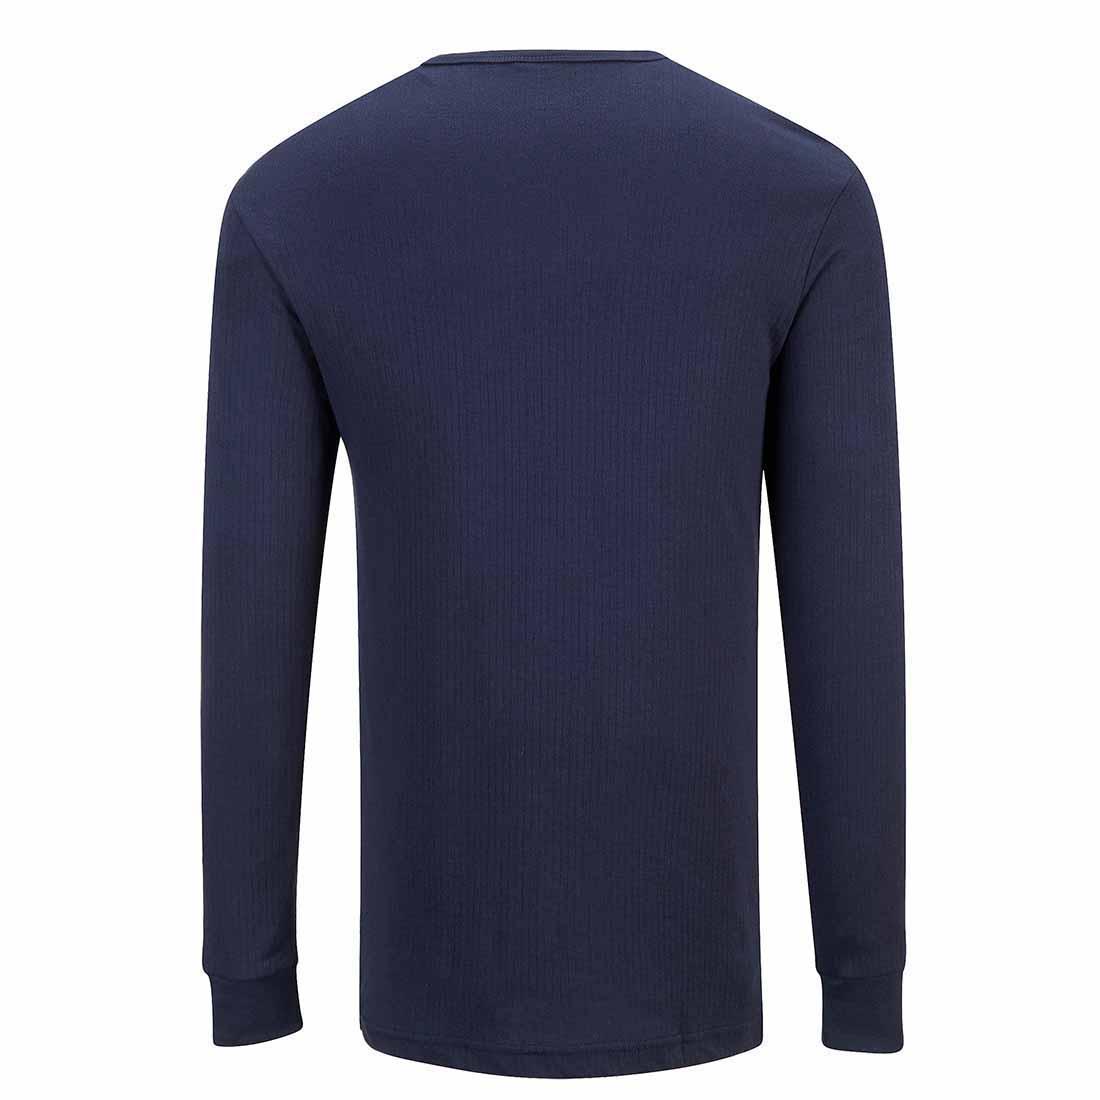 Portwest Workwear Mens Thermal Base Layer Underwear T